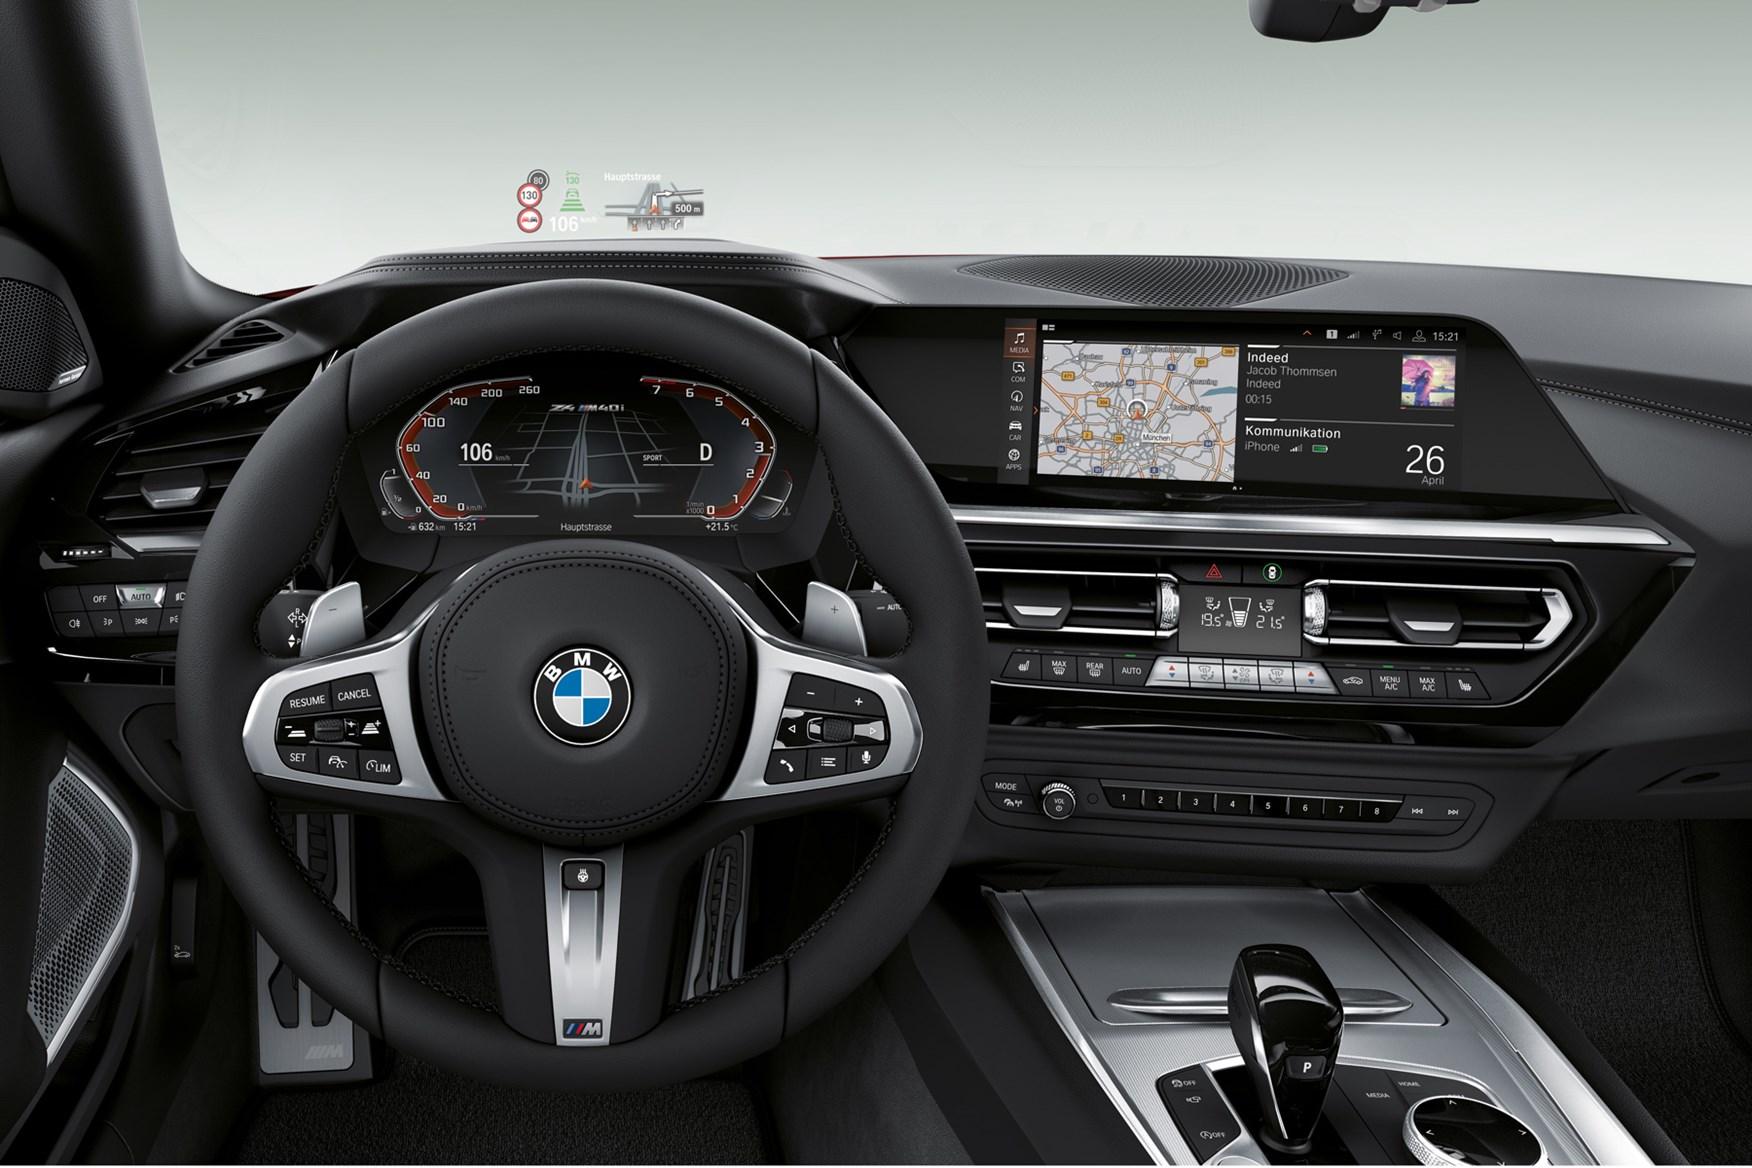 BMW Z4 (2019) M40i First Edition cabin